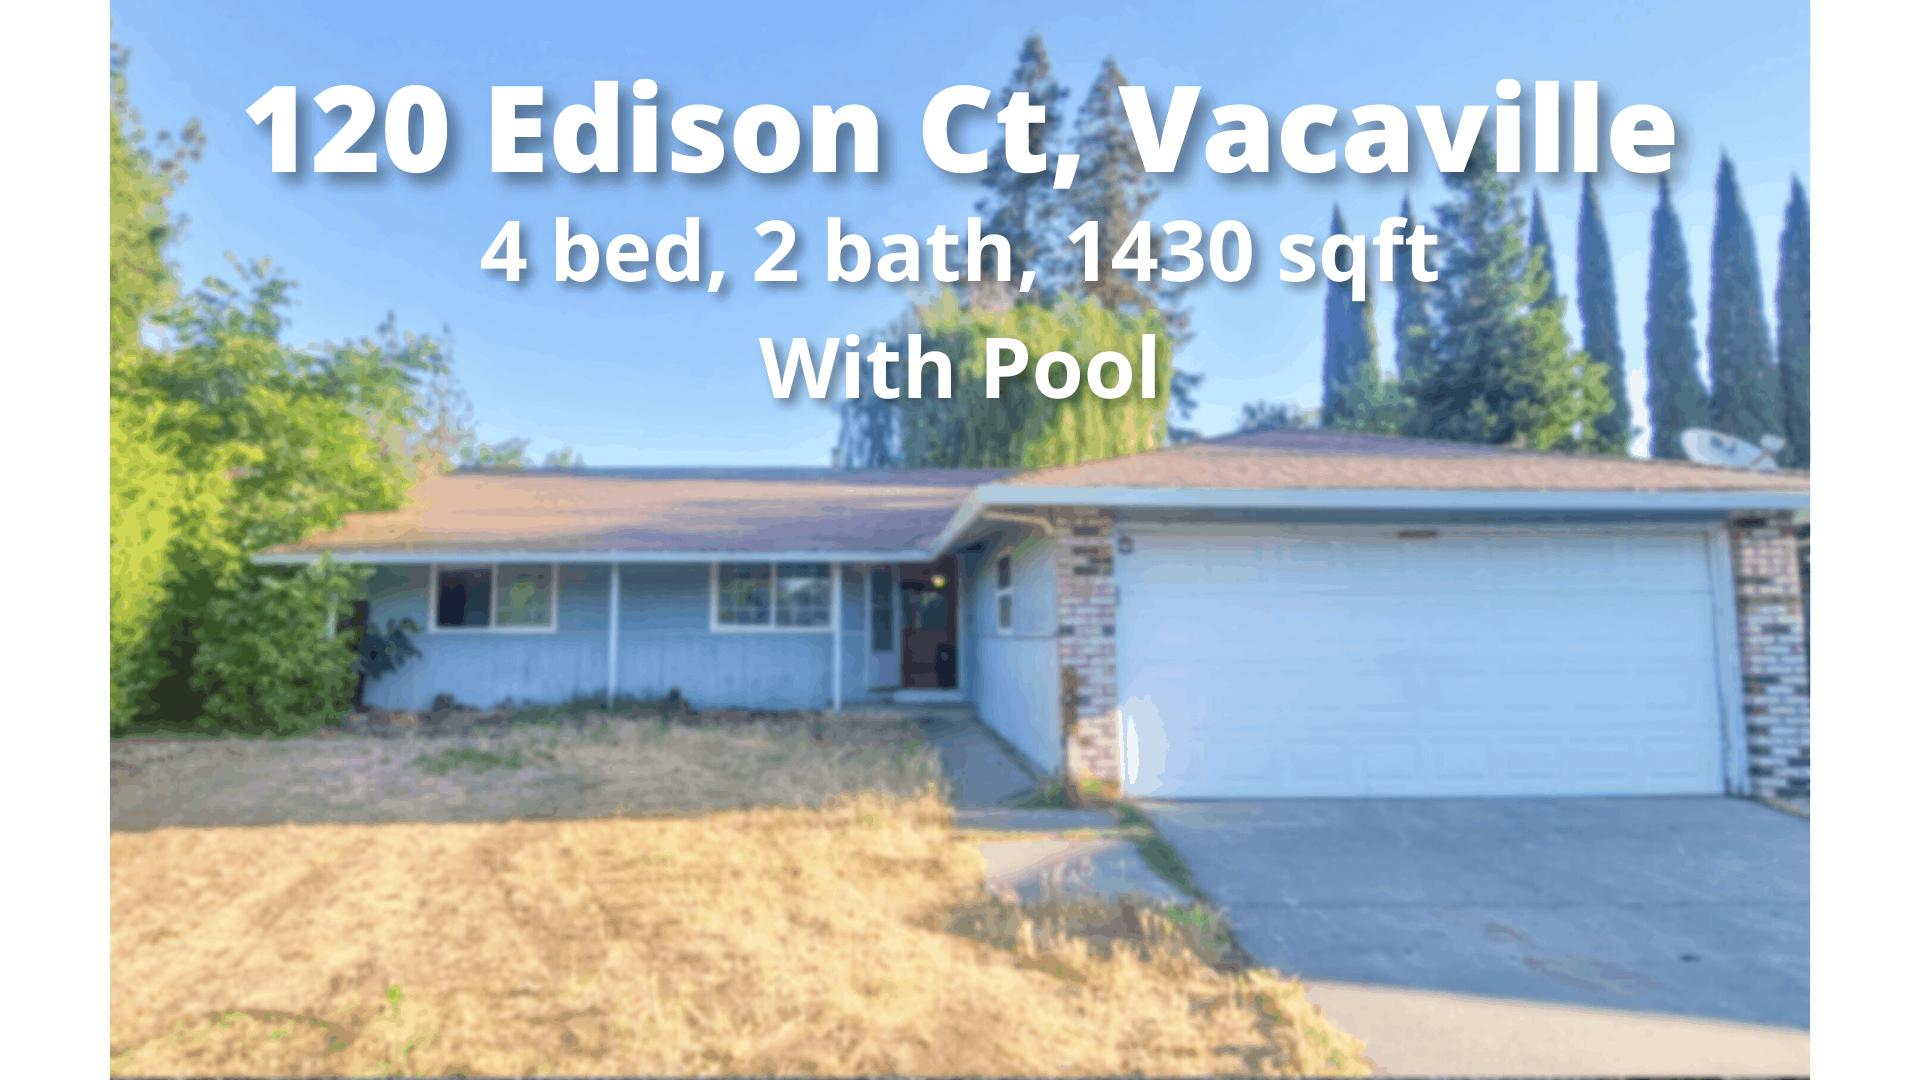 120 Edison Ct, Vacaville Photo main